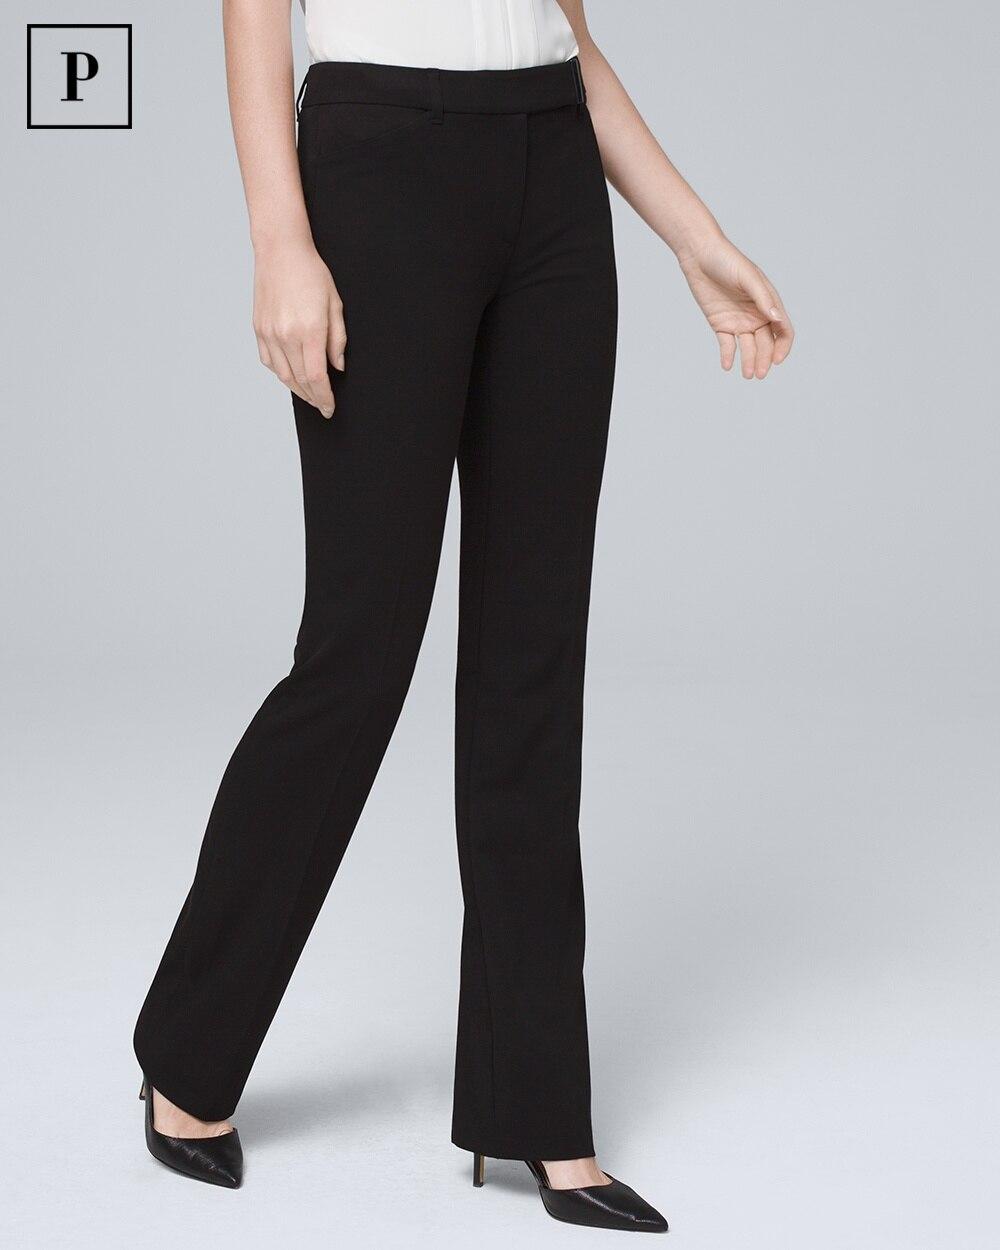 c0319a194e6 Petite All-Season Slim Bootcut Pants - White House Black Market